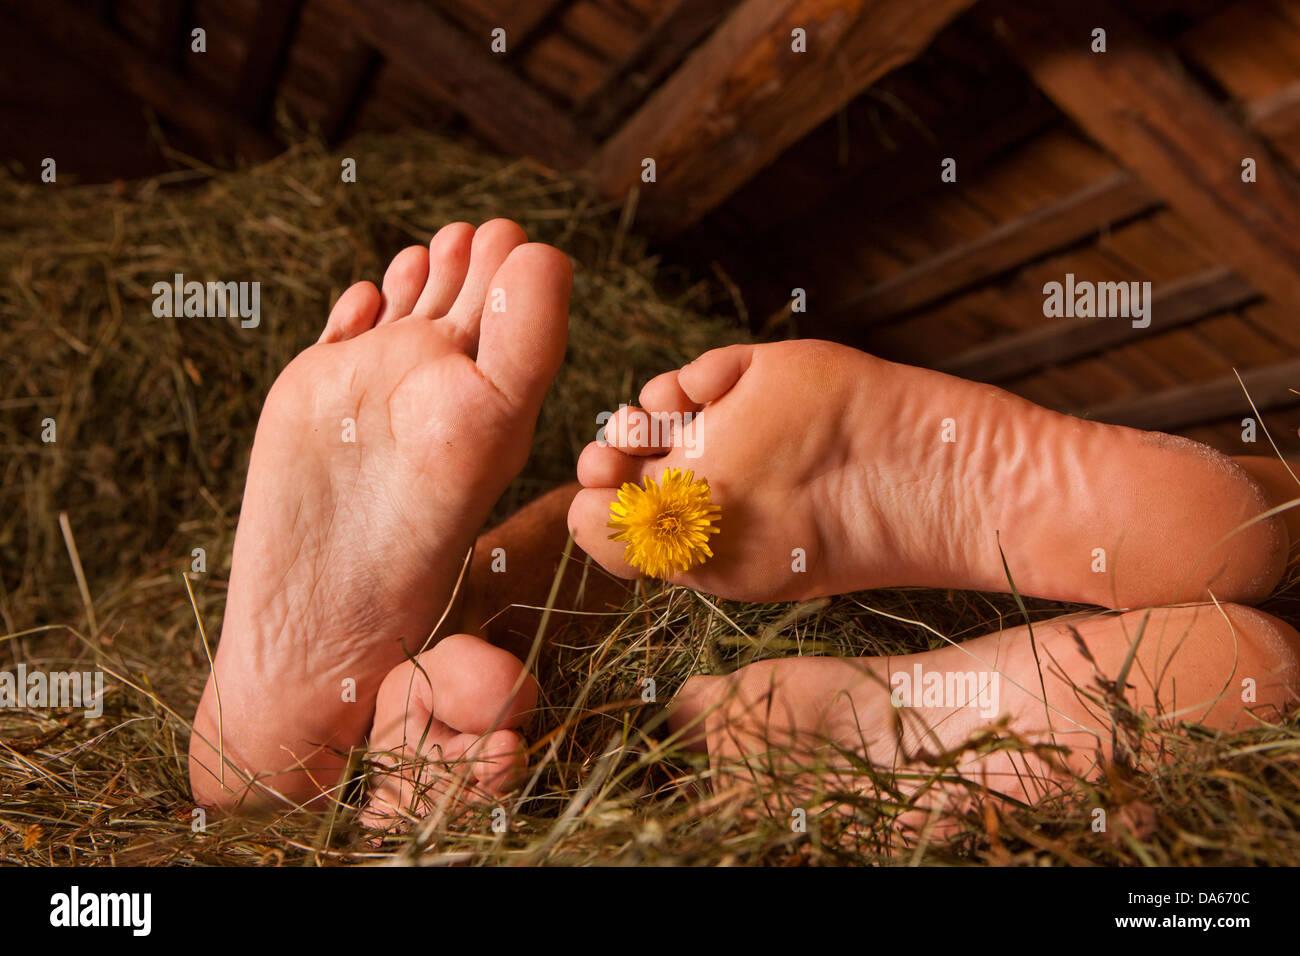 Couple, alpine hut, sleeping, hay, mountain, mountains, canton, Bern, Bernese Oberland, agriculture, holidays, farm, - Stock Image